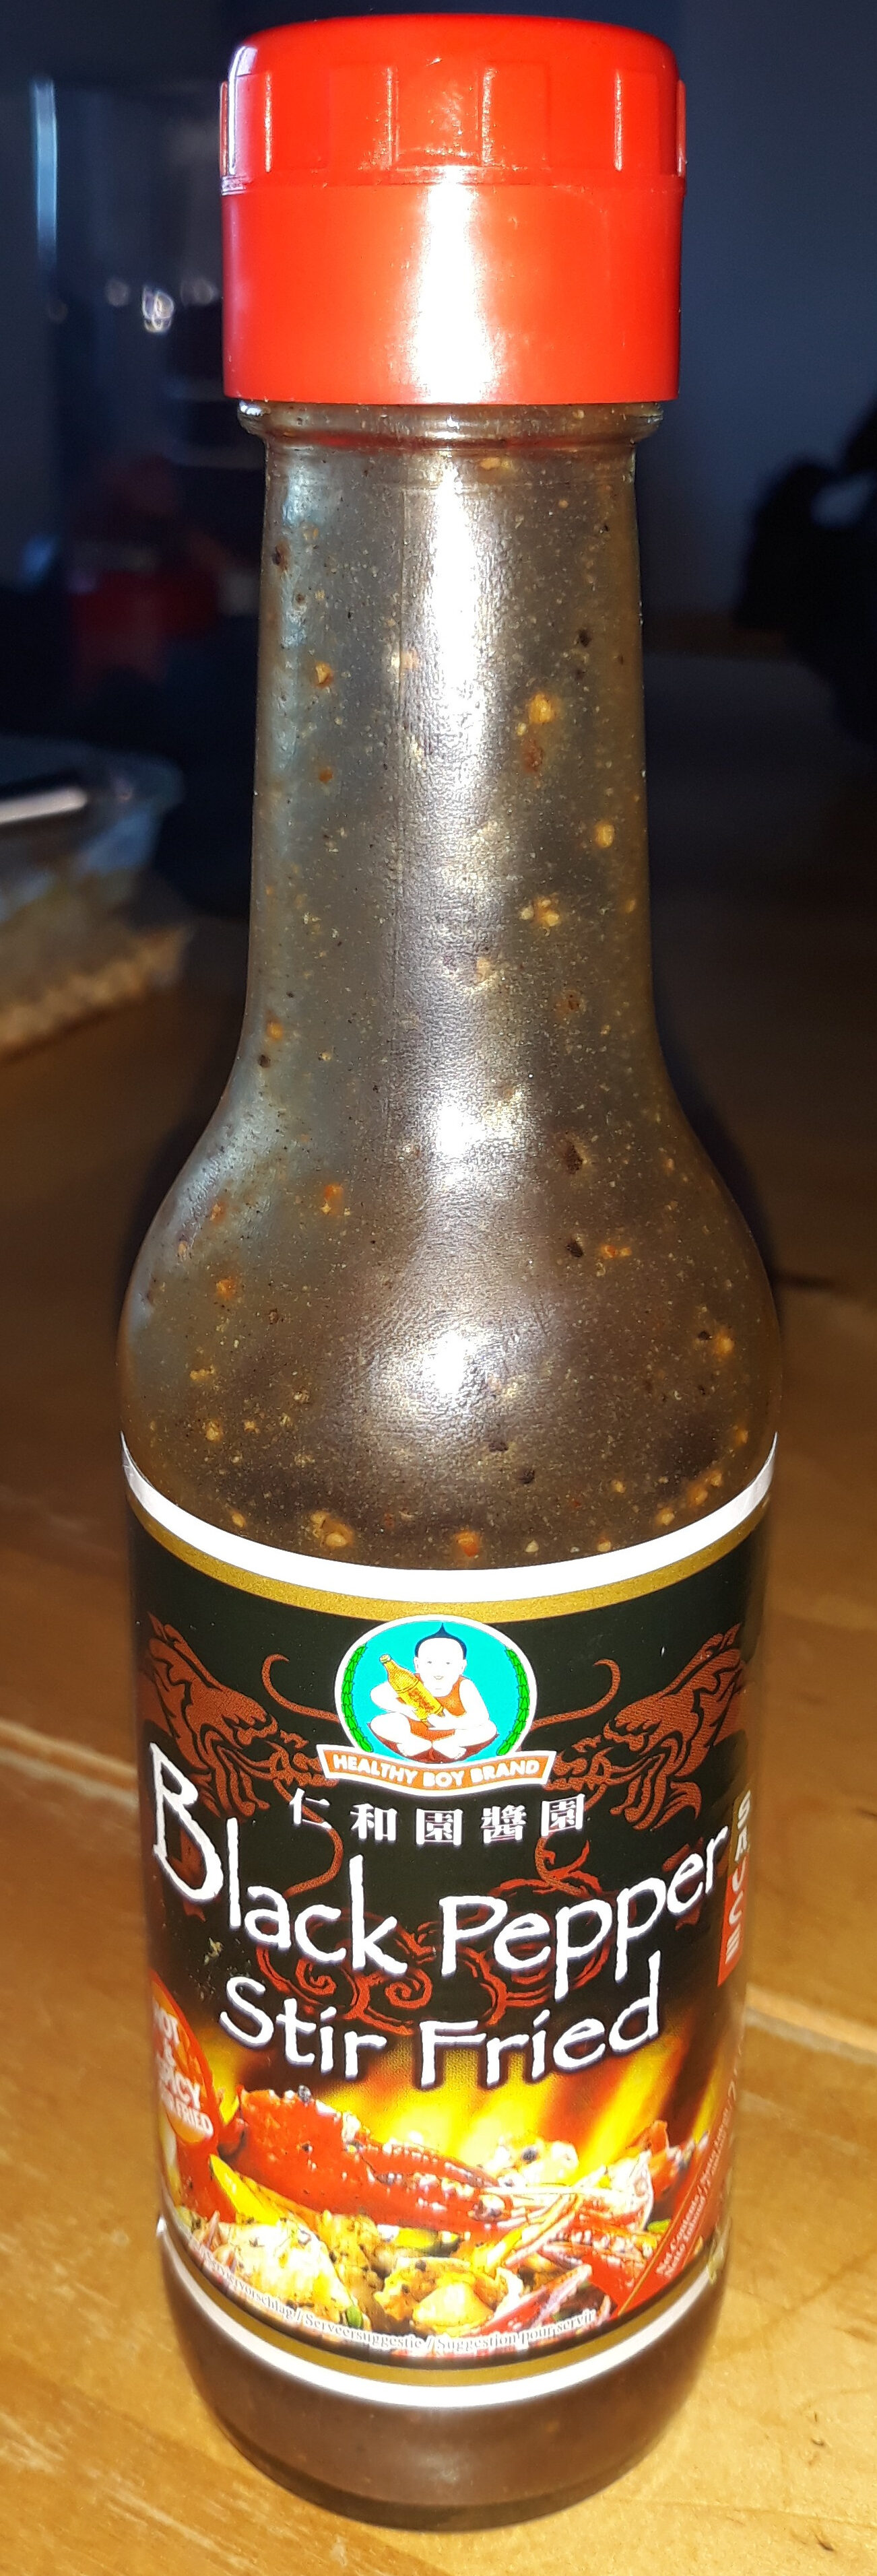 Black Pepper Stir Fried - Product